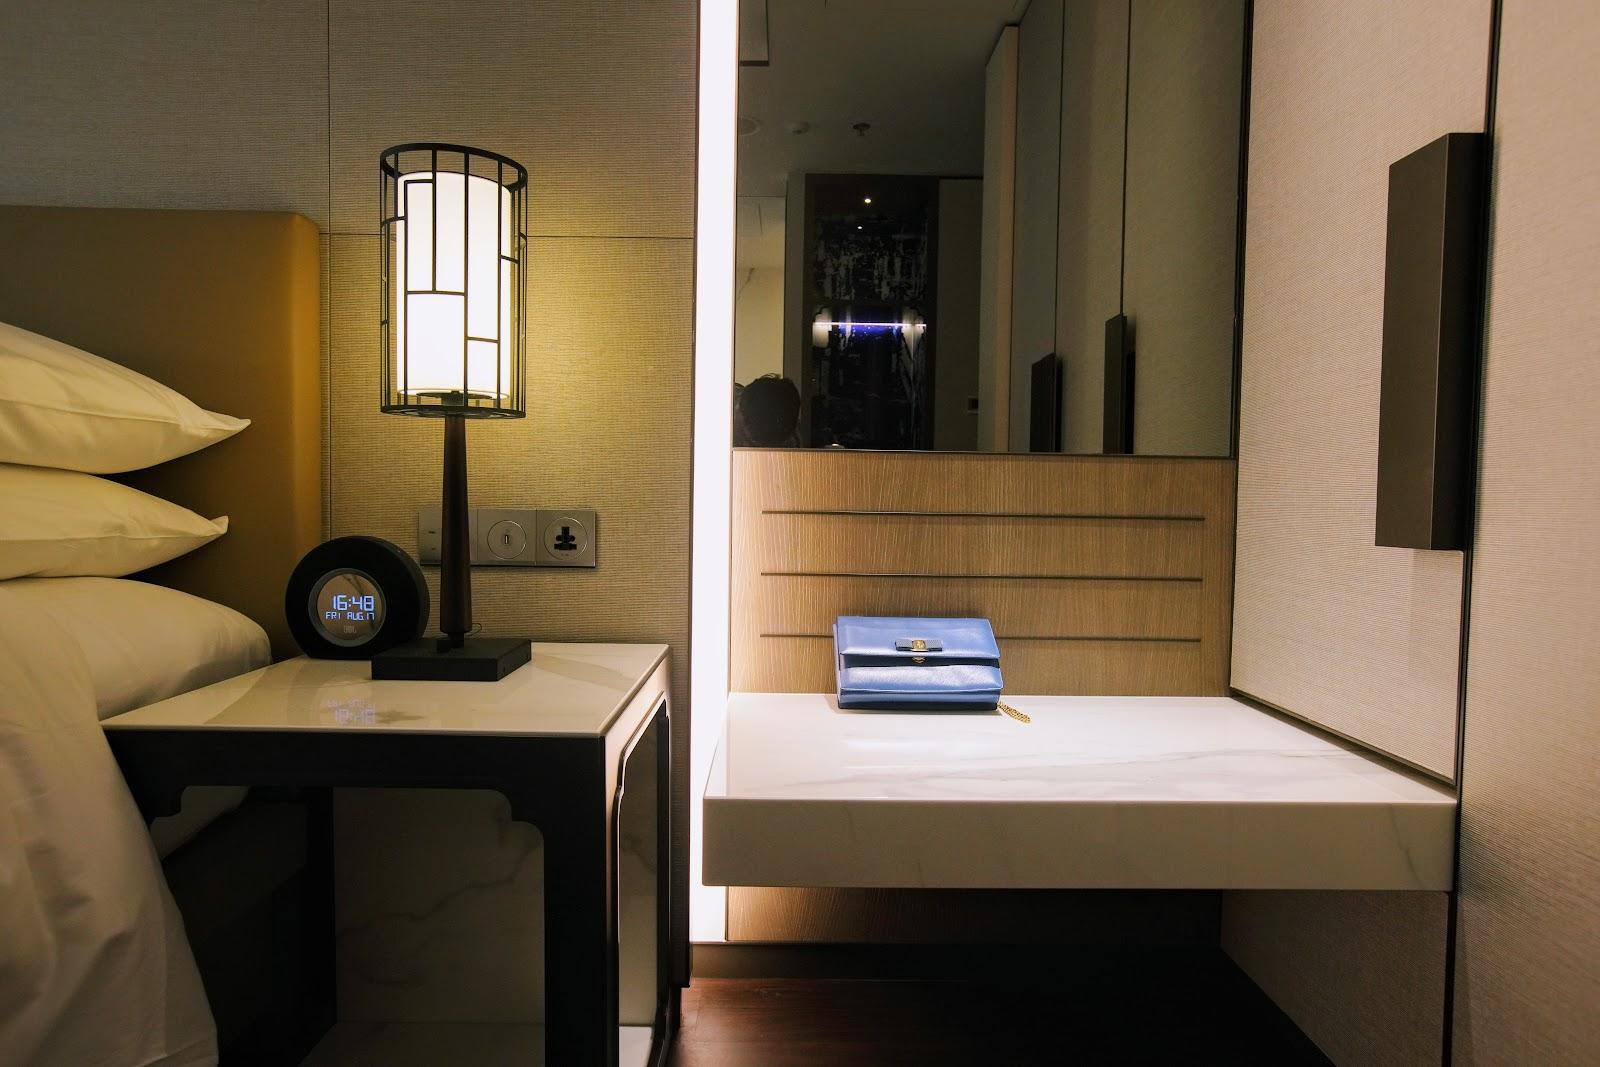 住宿|台北士林萬麗酒店 Renaissance Taipei Shihlin Hotel